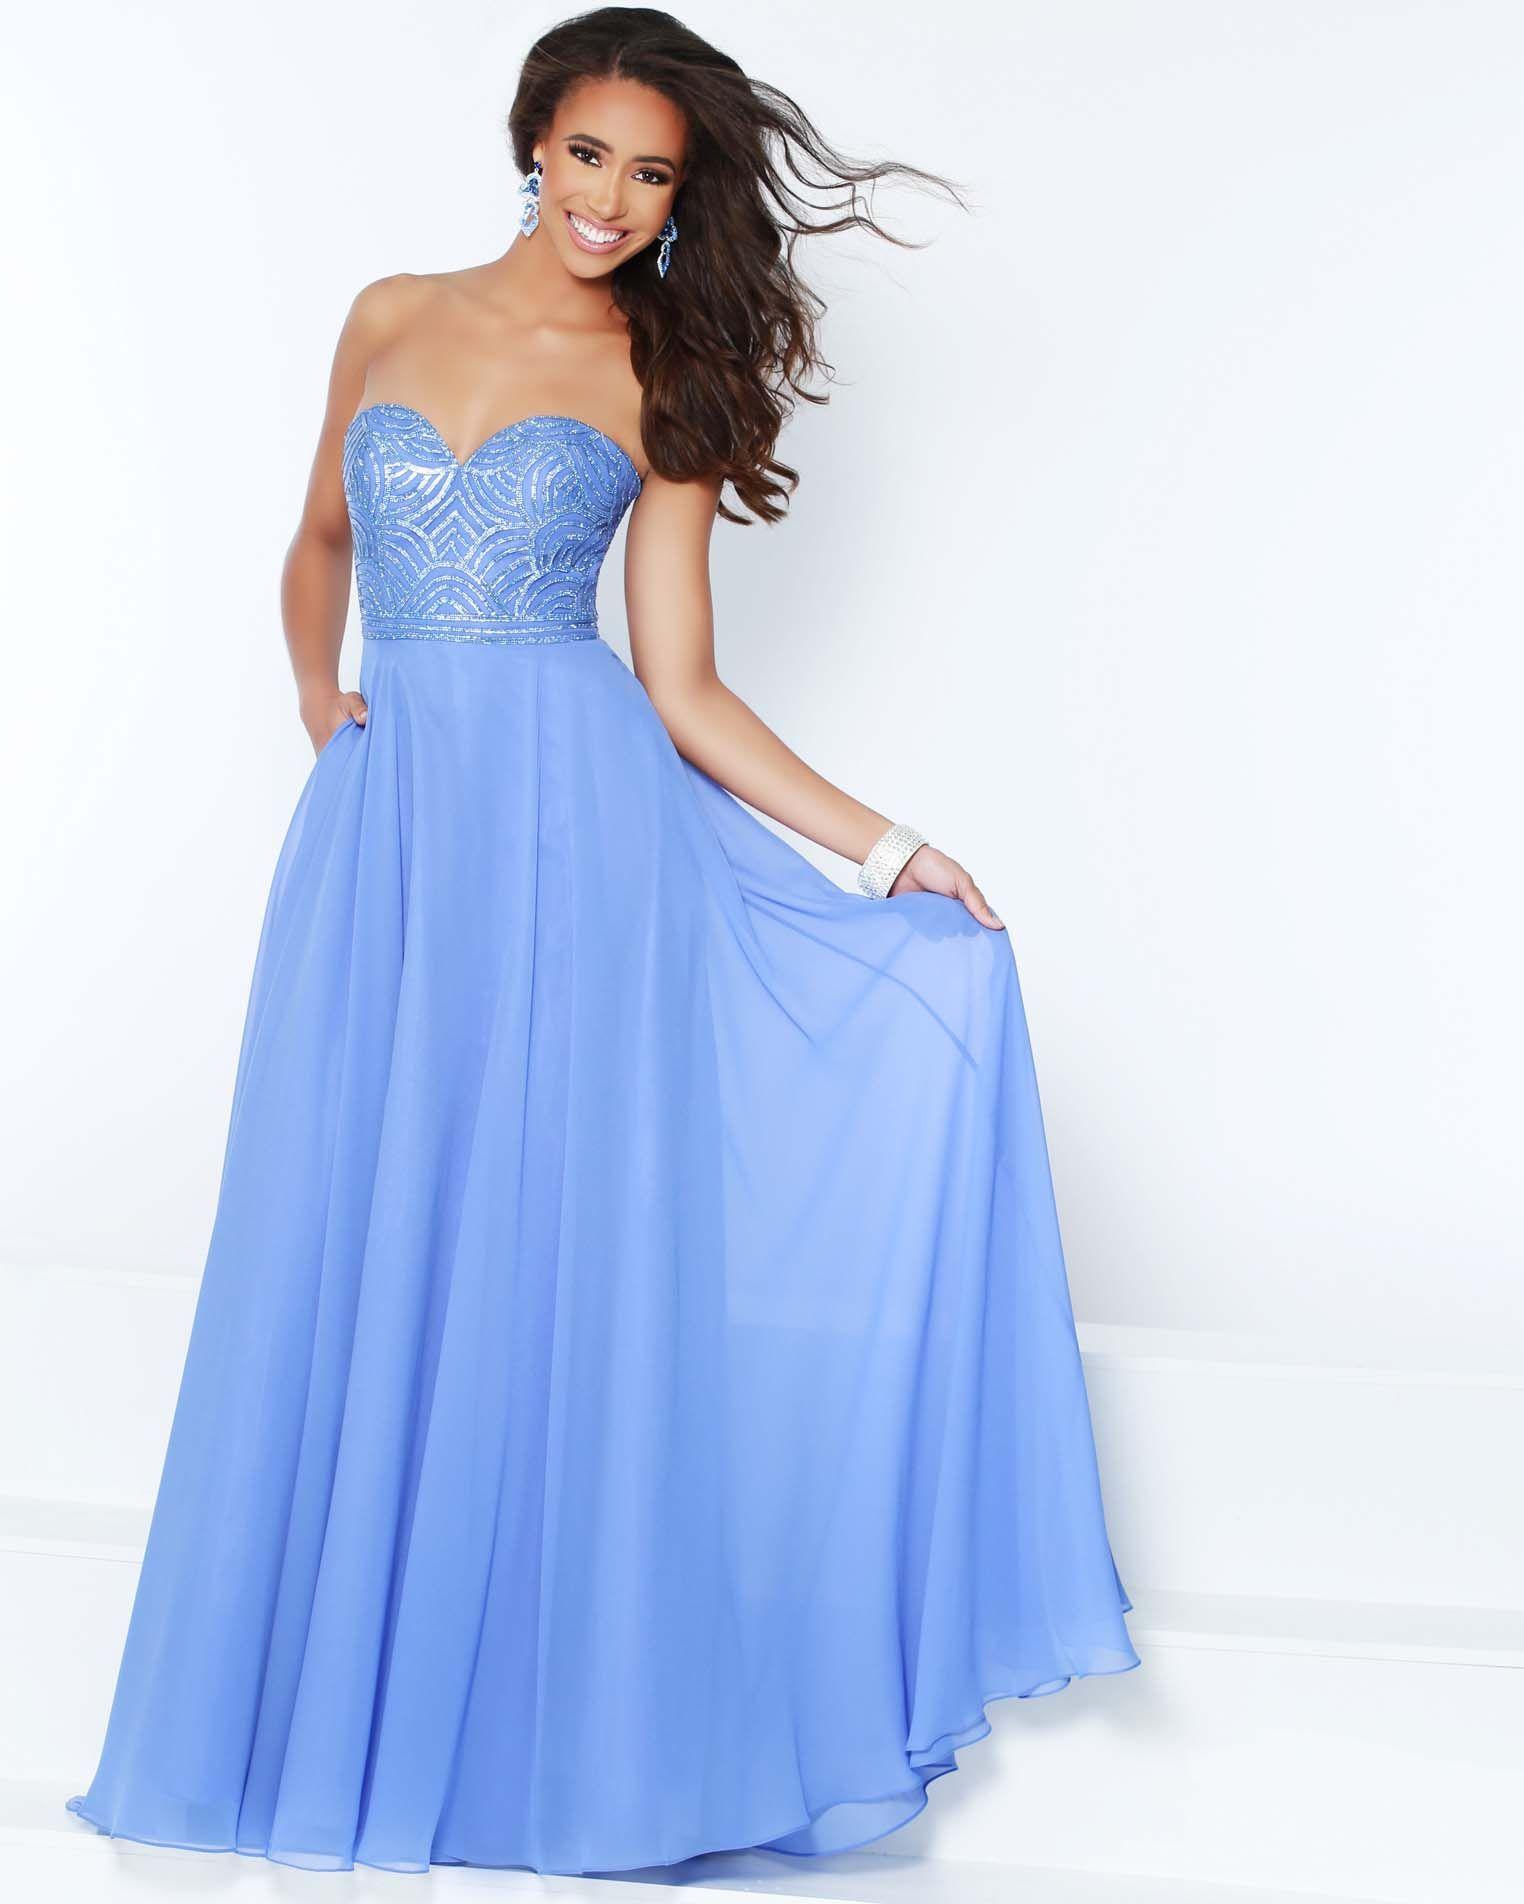 92366162954 2cute Prom Dresses - Data Dynamic AG